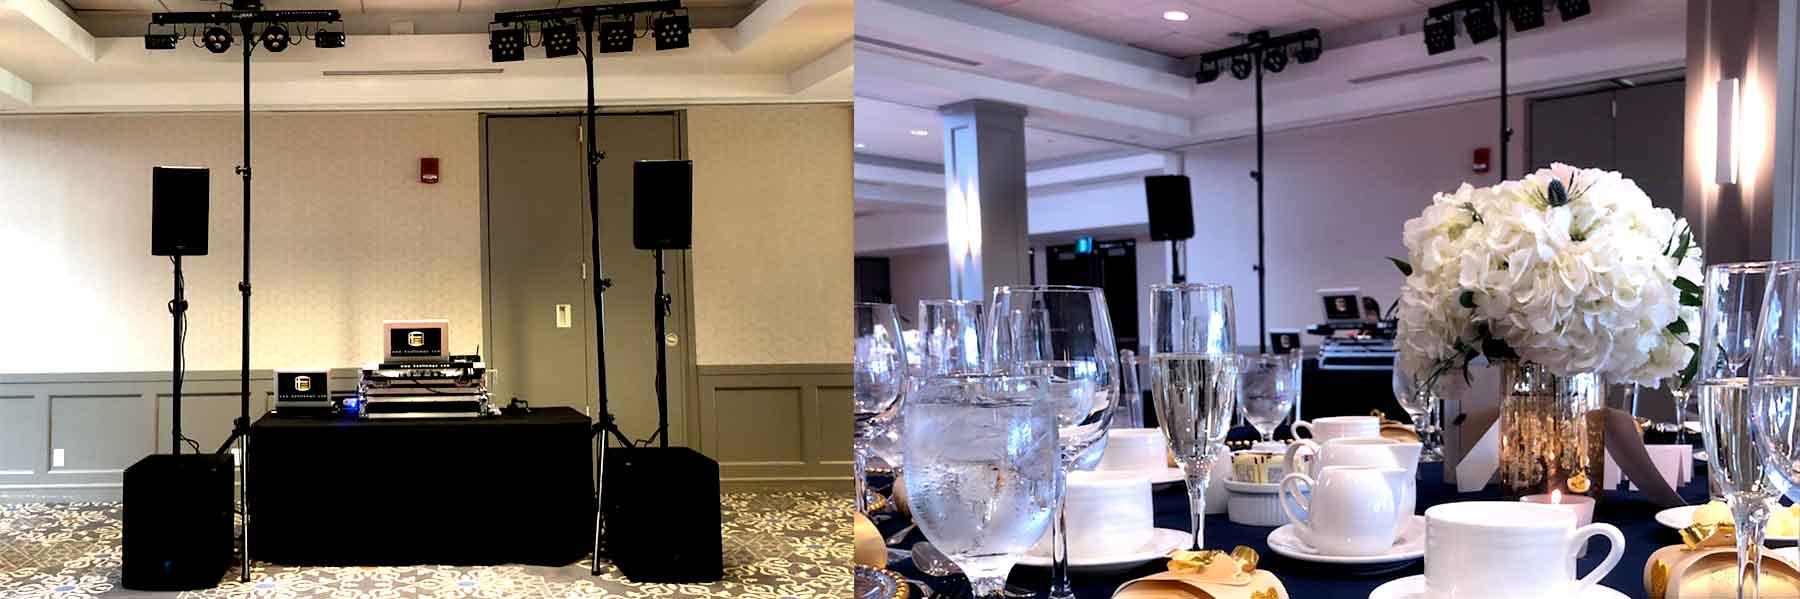 Bayview-Golf-ThornHill-Wedding-DJ-Set-up-&-Decor